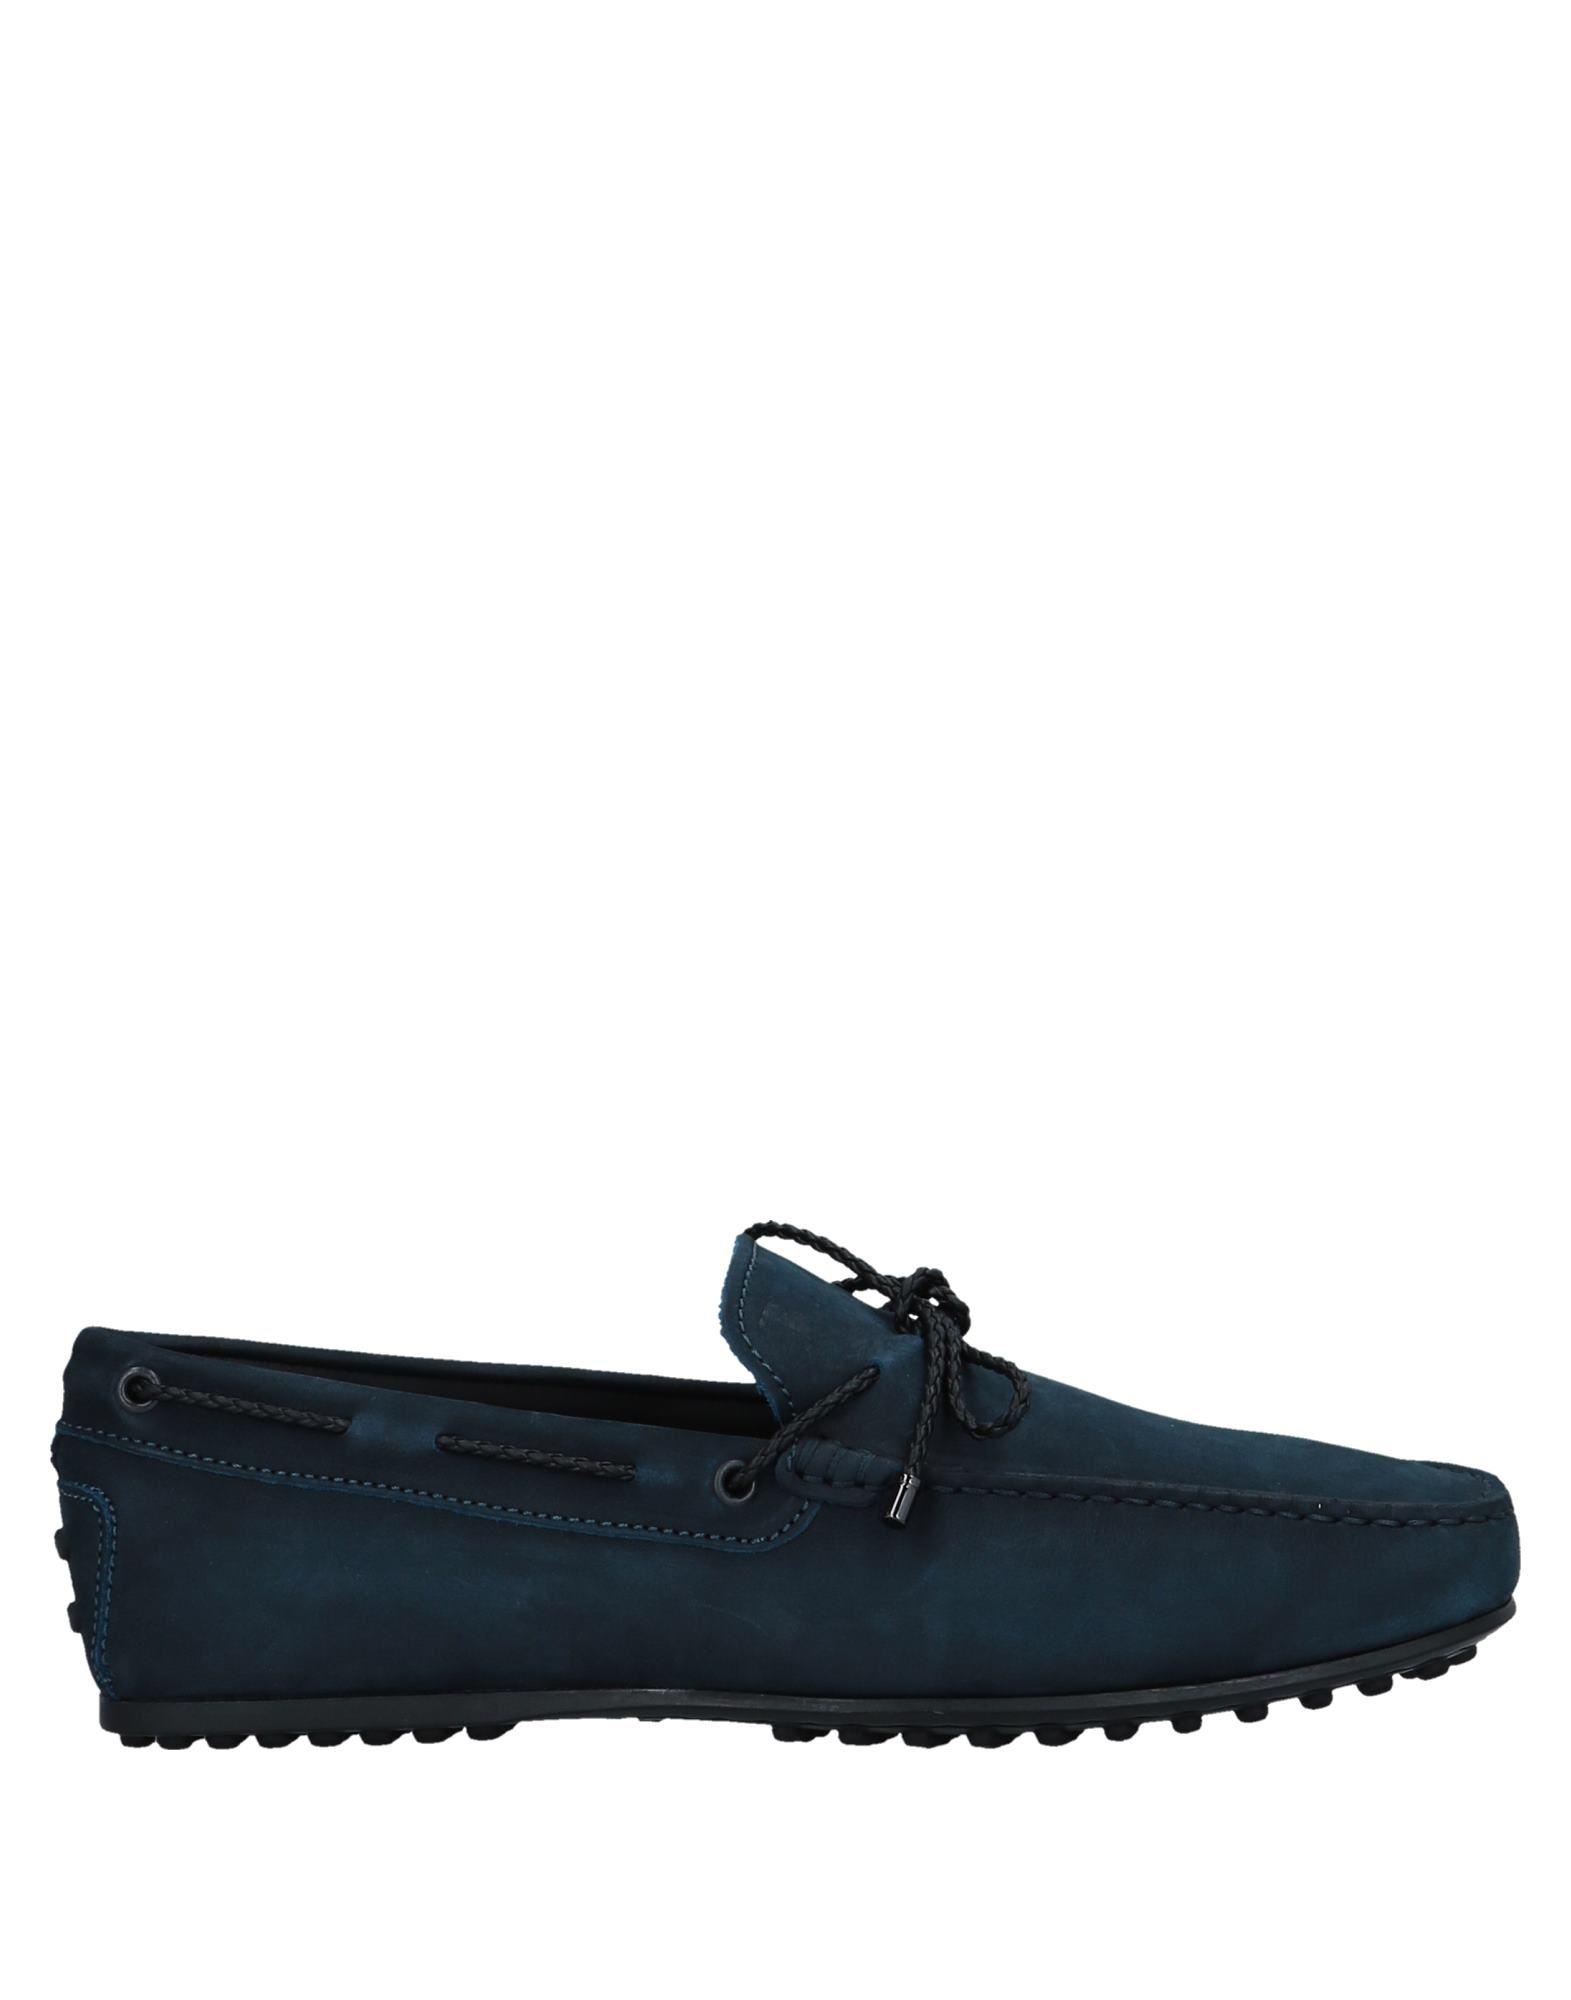 Tod's Mokassins Herren  11541235FB Gute Qualität beliebte Schuhe